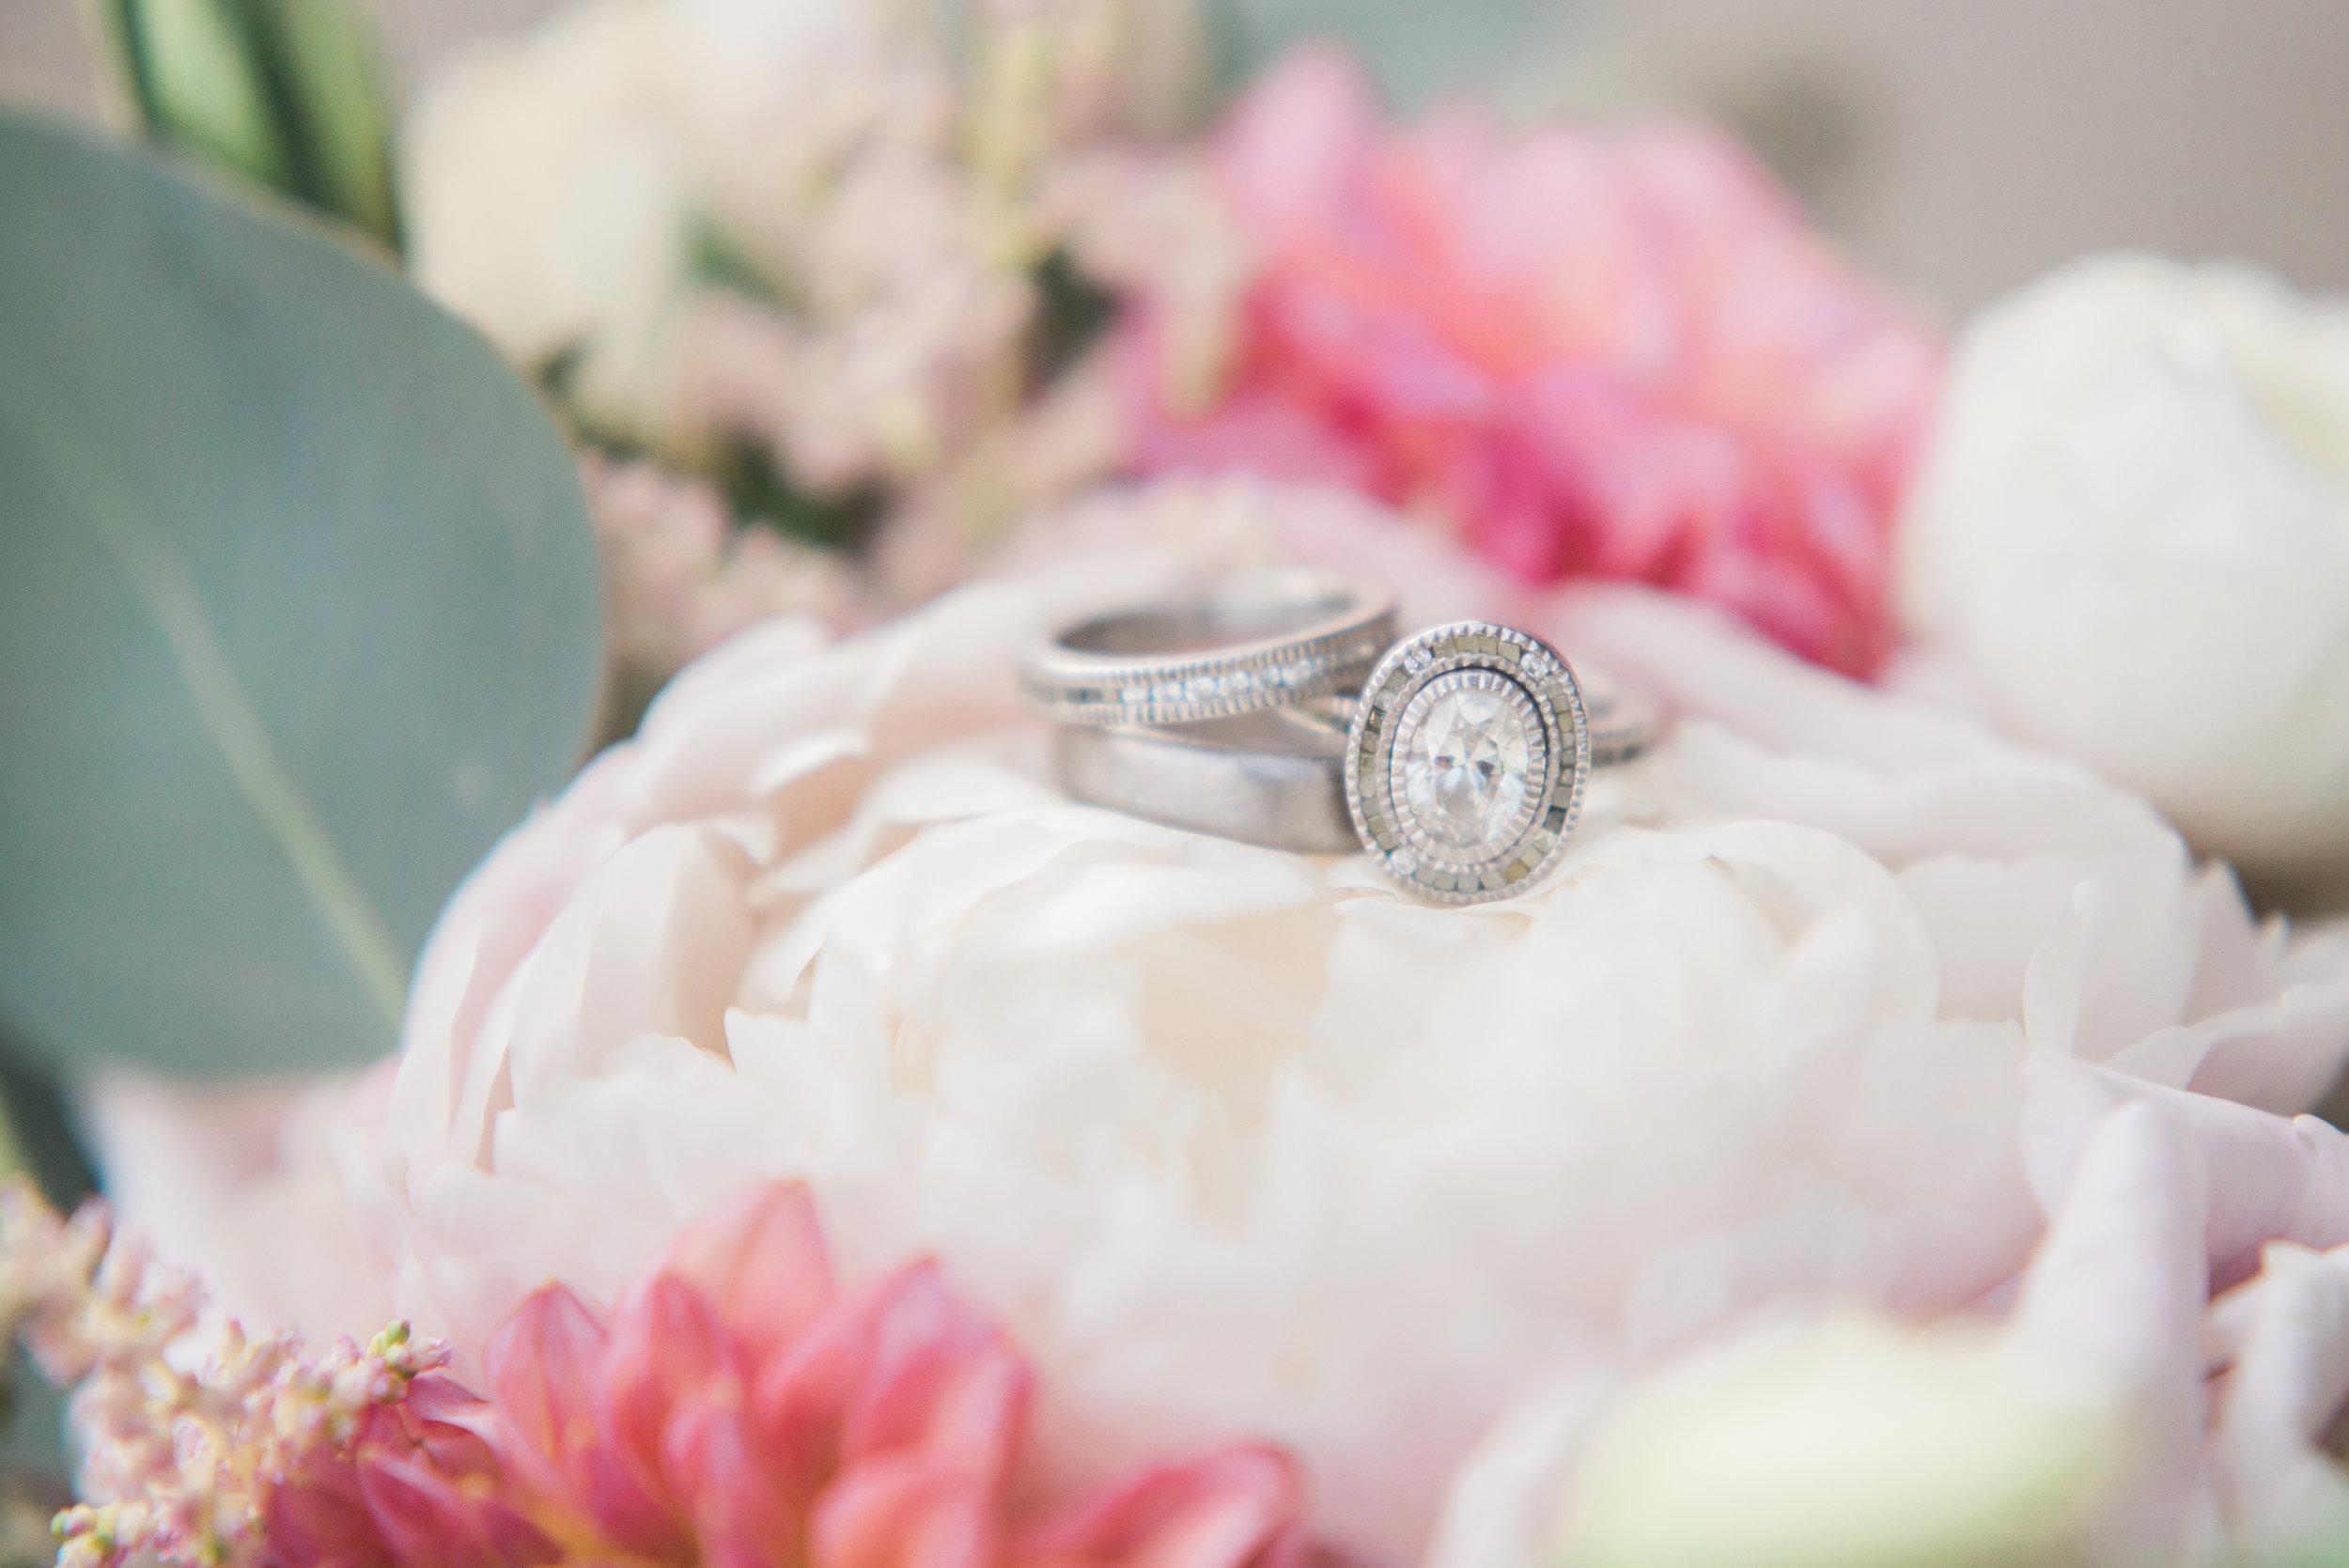 AshleighMillerWeddingPhotography-Denver-Breckenridge-weddingring-1833.jpg